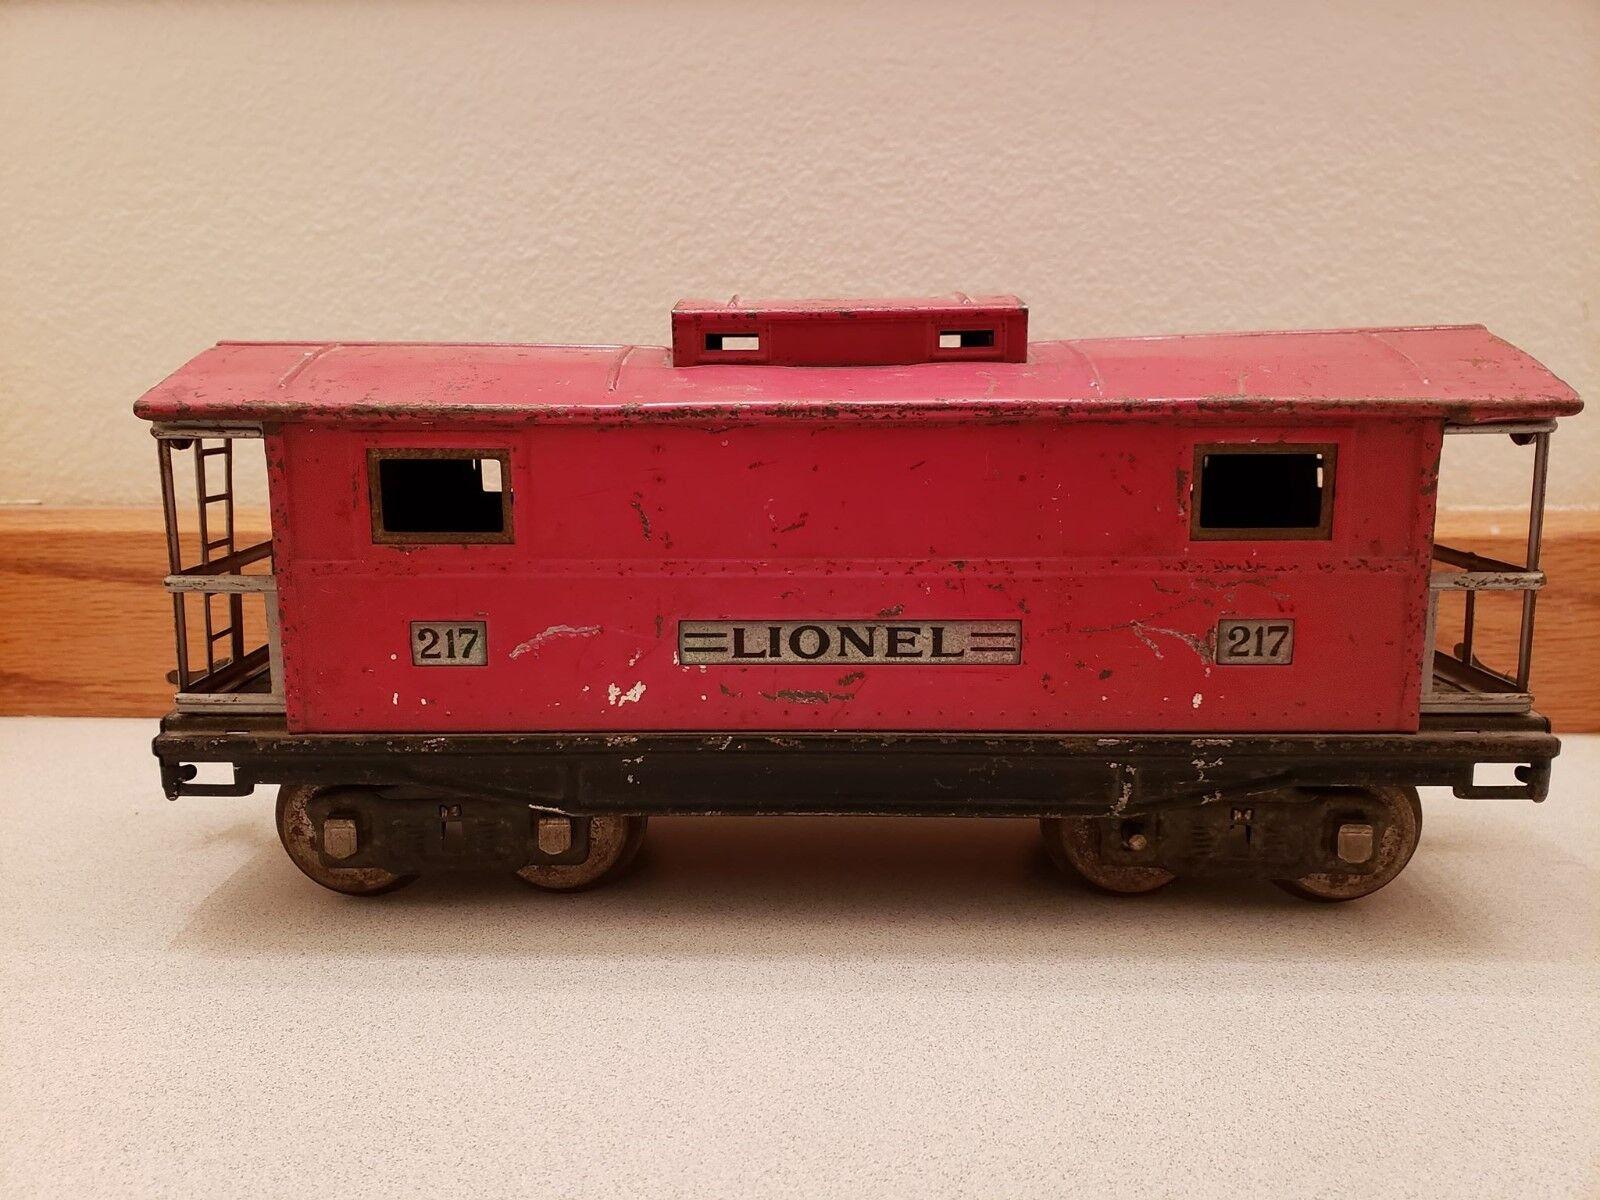 Lionel 217 Prewar Standard Gauge Tinplate Red Caboose